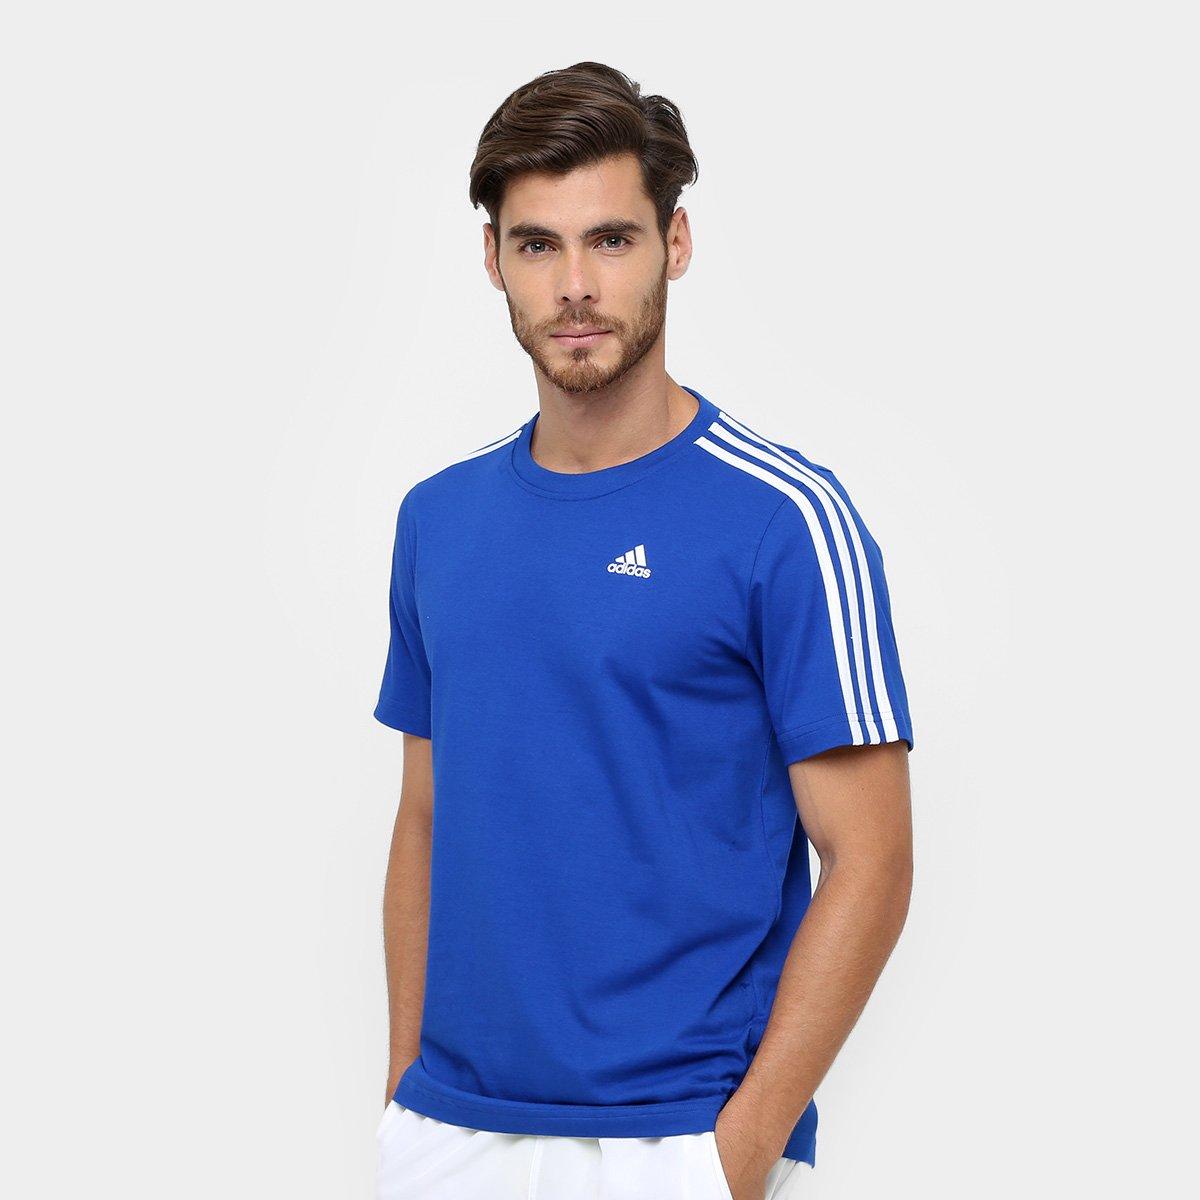 56d618c784429 Camiseta Adidas Ess 3S Tee Masculina | Netshoes